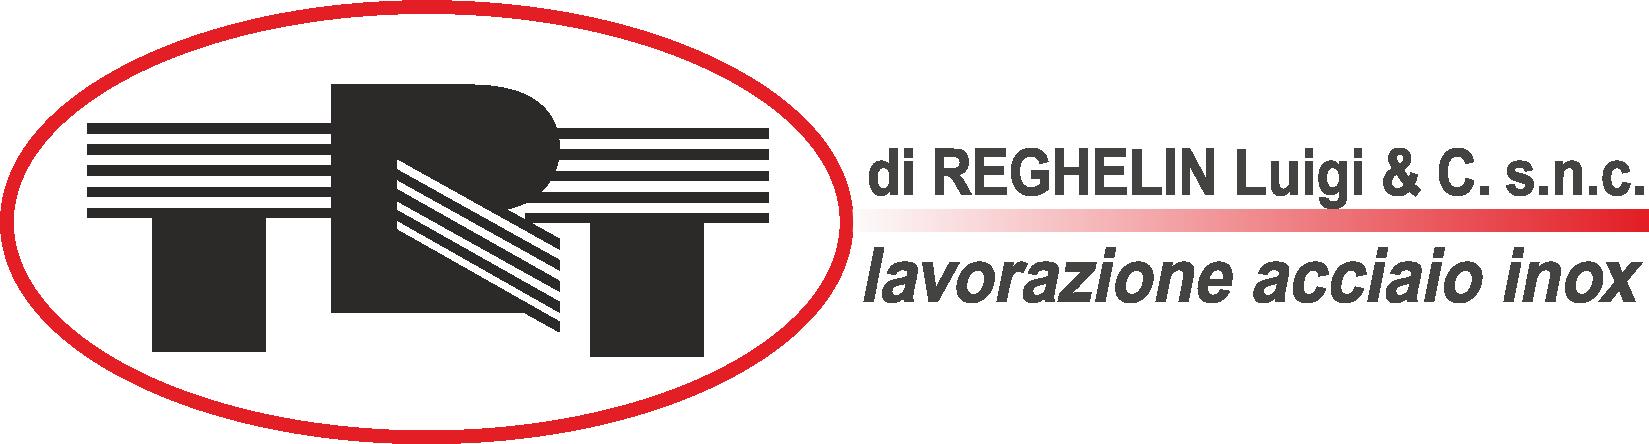 TRT di Reghelin Luigi & C s.n.c